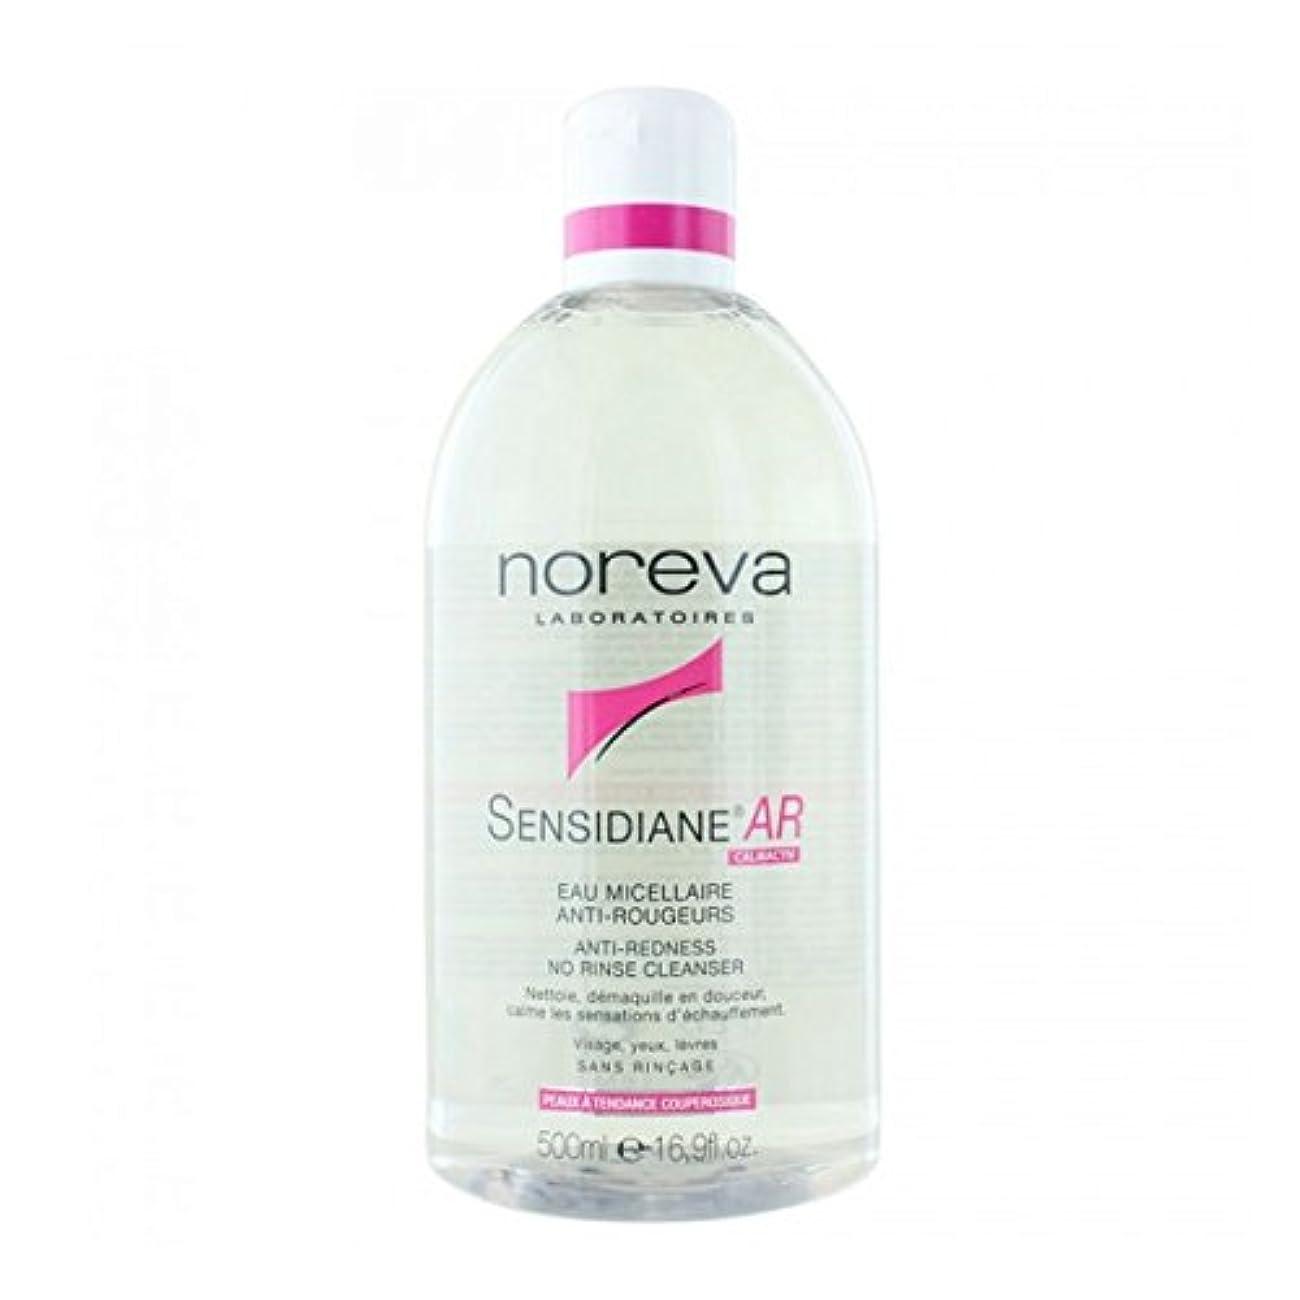 屋内必需品章Noreva Sensidiane Ar Anti-redness No Rinse Cleanser 500ml [並行輸入品]